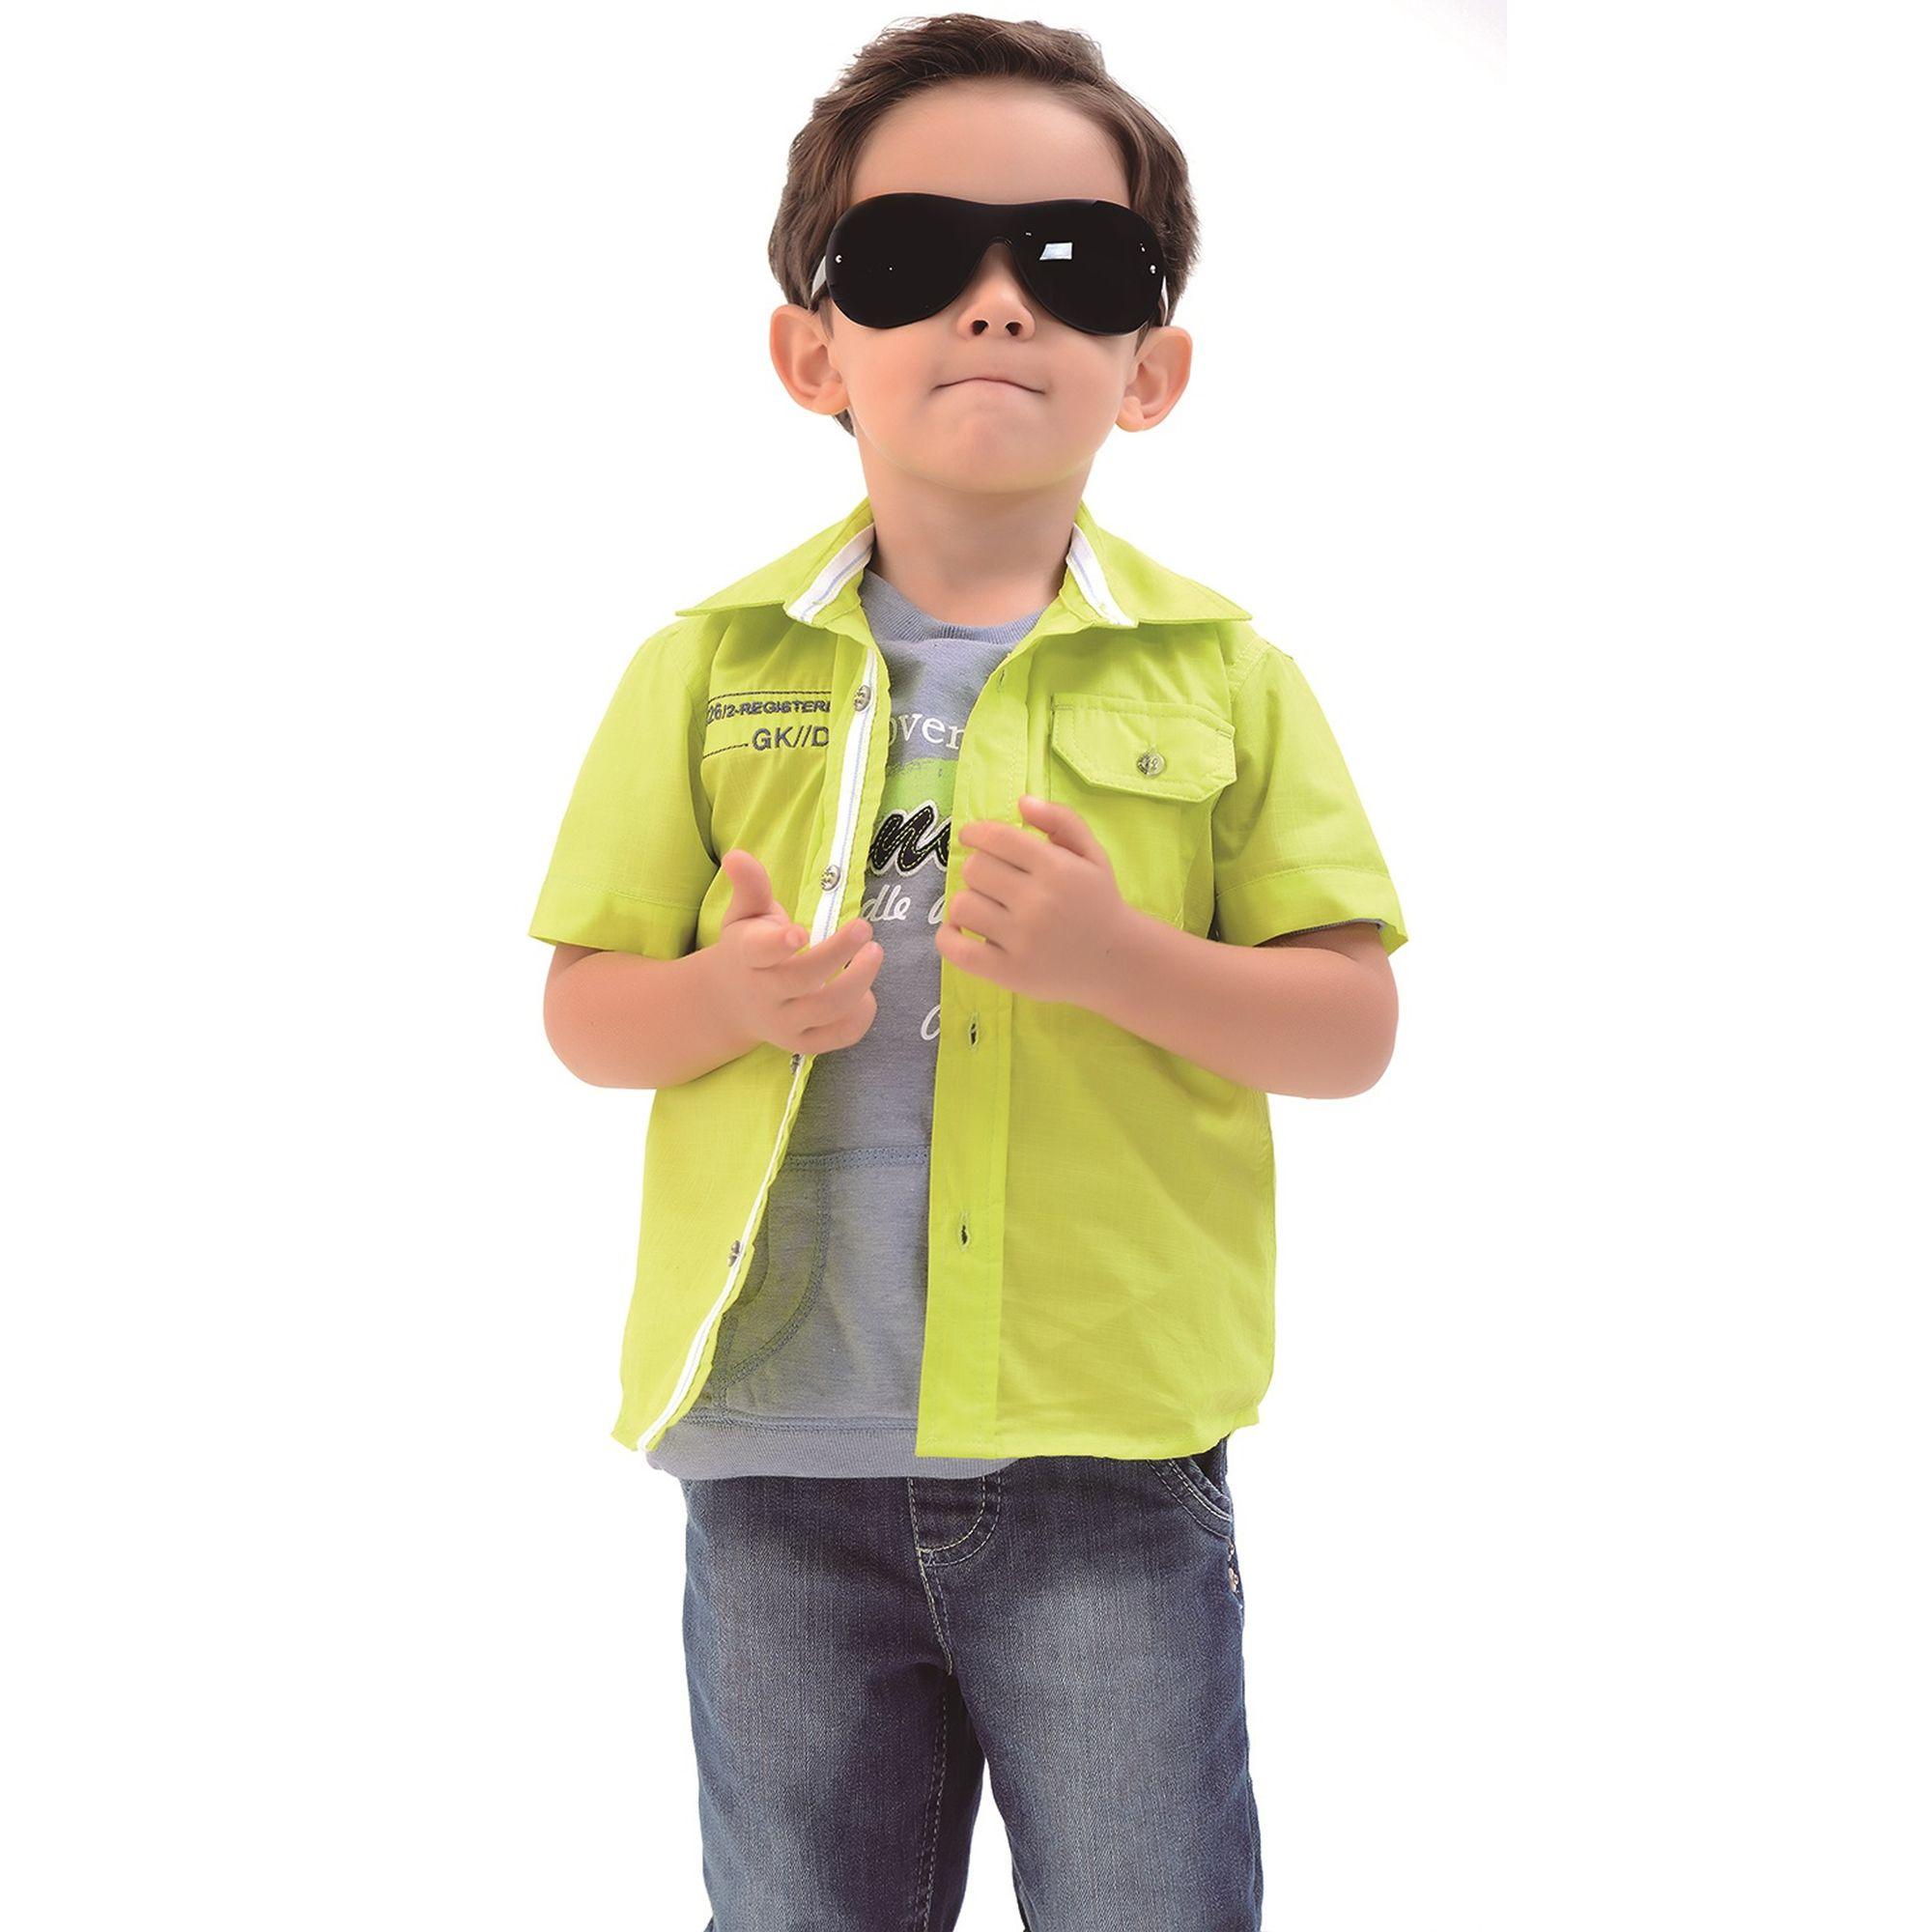 952d64a1f5 Conjunto Infantil Menino Camisa Cítrica e Bermuda Jeans - Roupas Infantil  EcaMeleca Kids - EcaMeleca